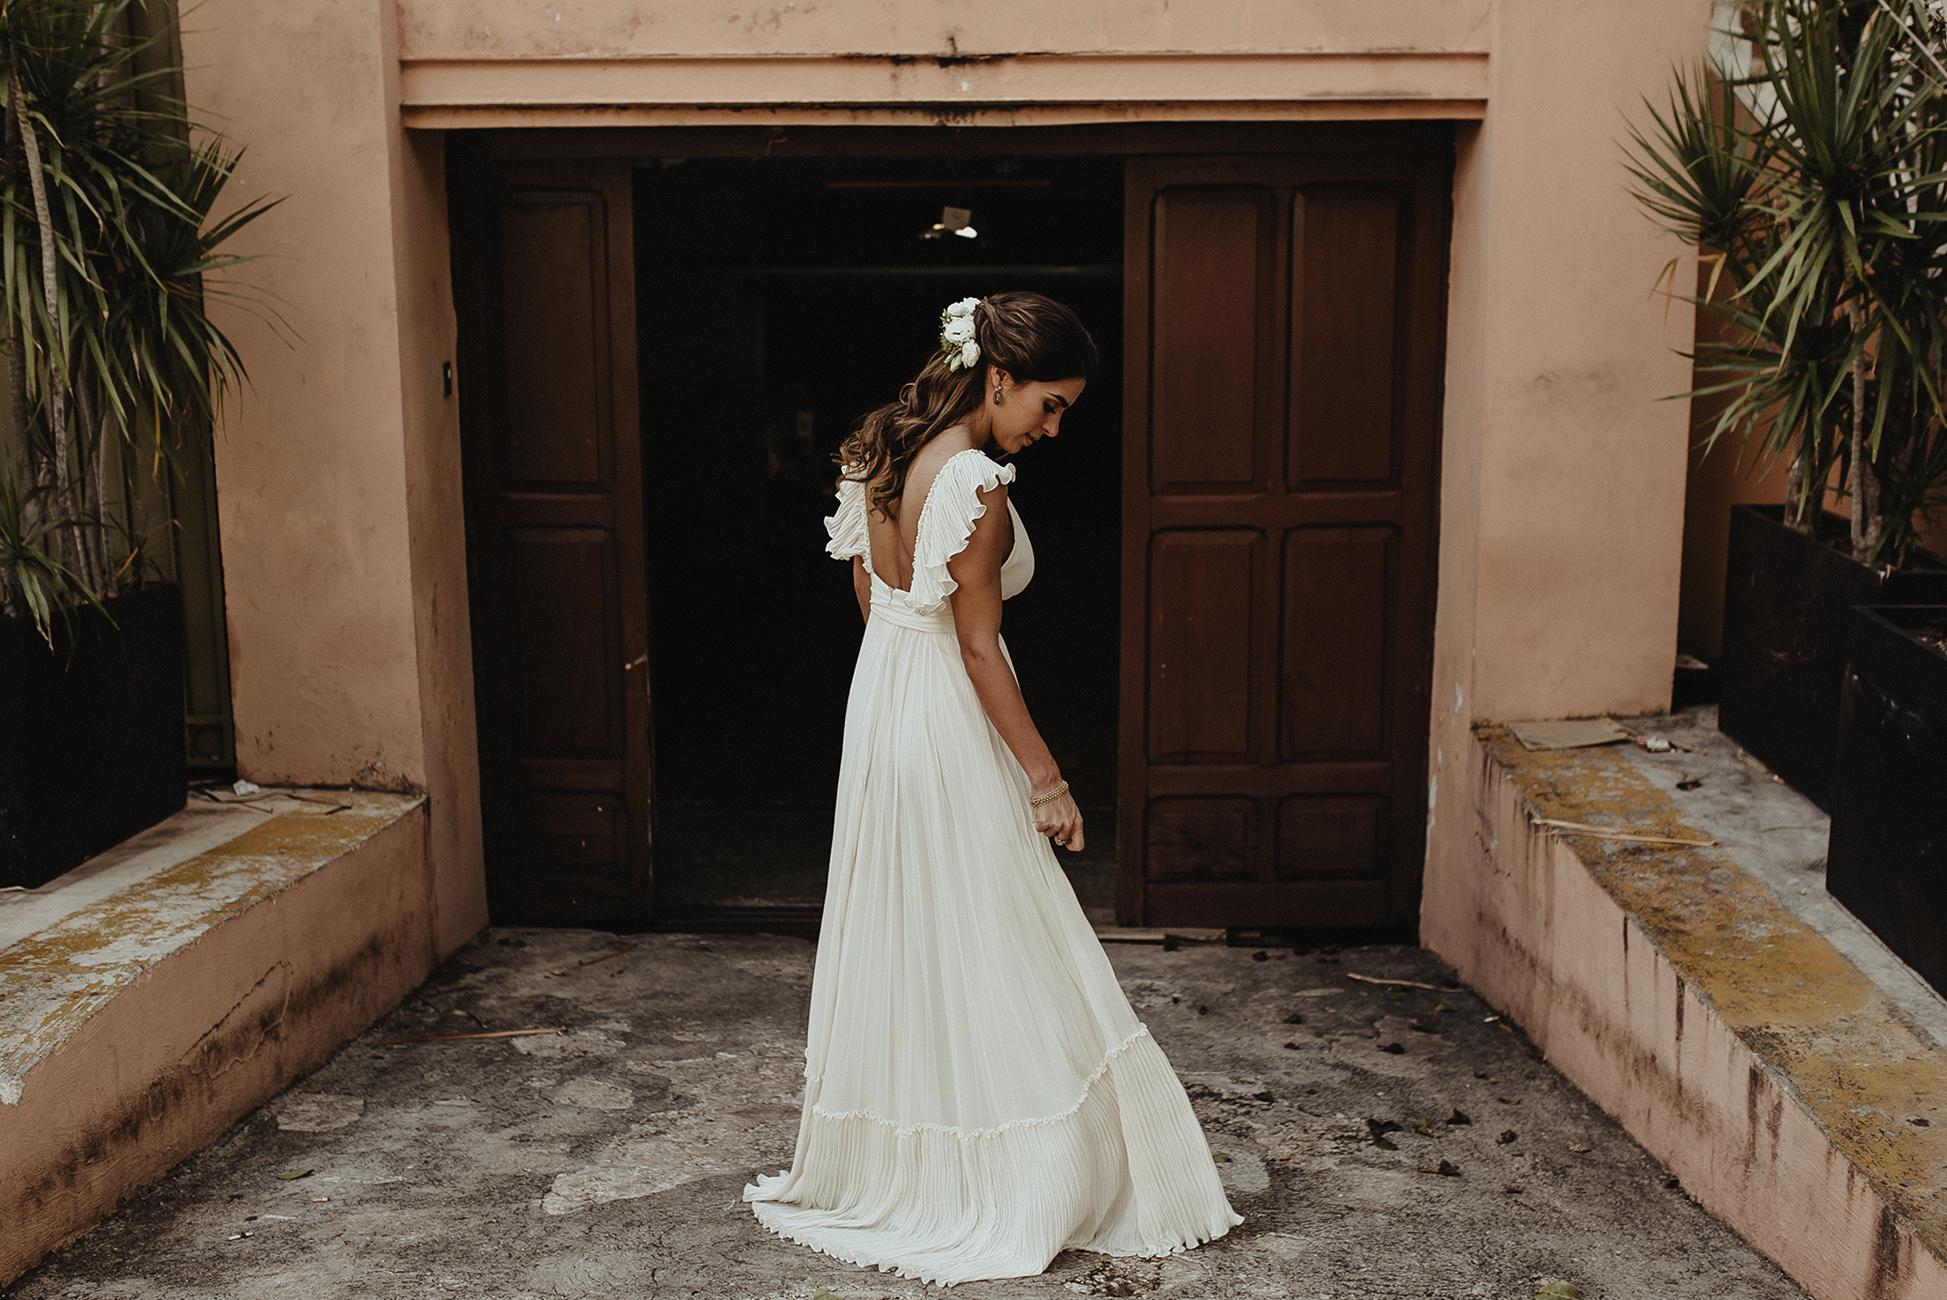 0023civil_Hacienda_WeddingDstination_MeridaYucatan_HaciendasMerida_BodasMexico_BodasYucatan_Boda_Destino.jpg